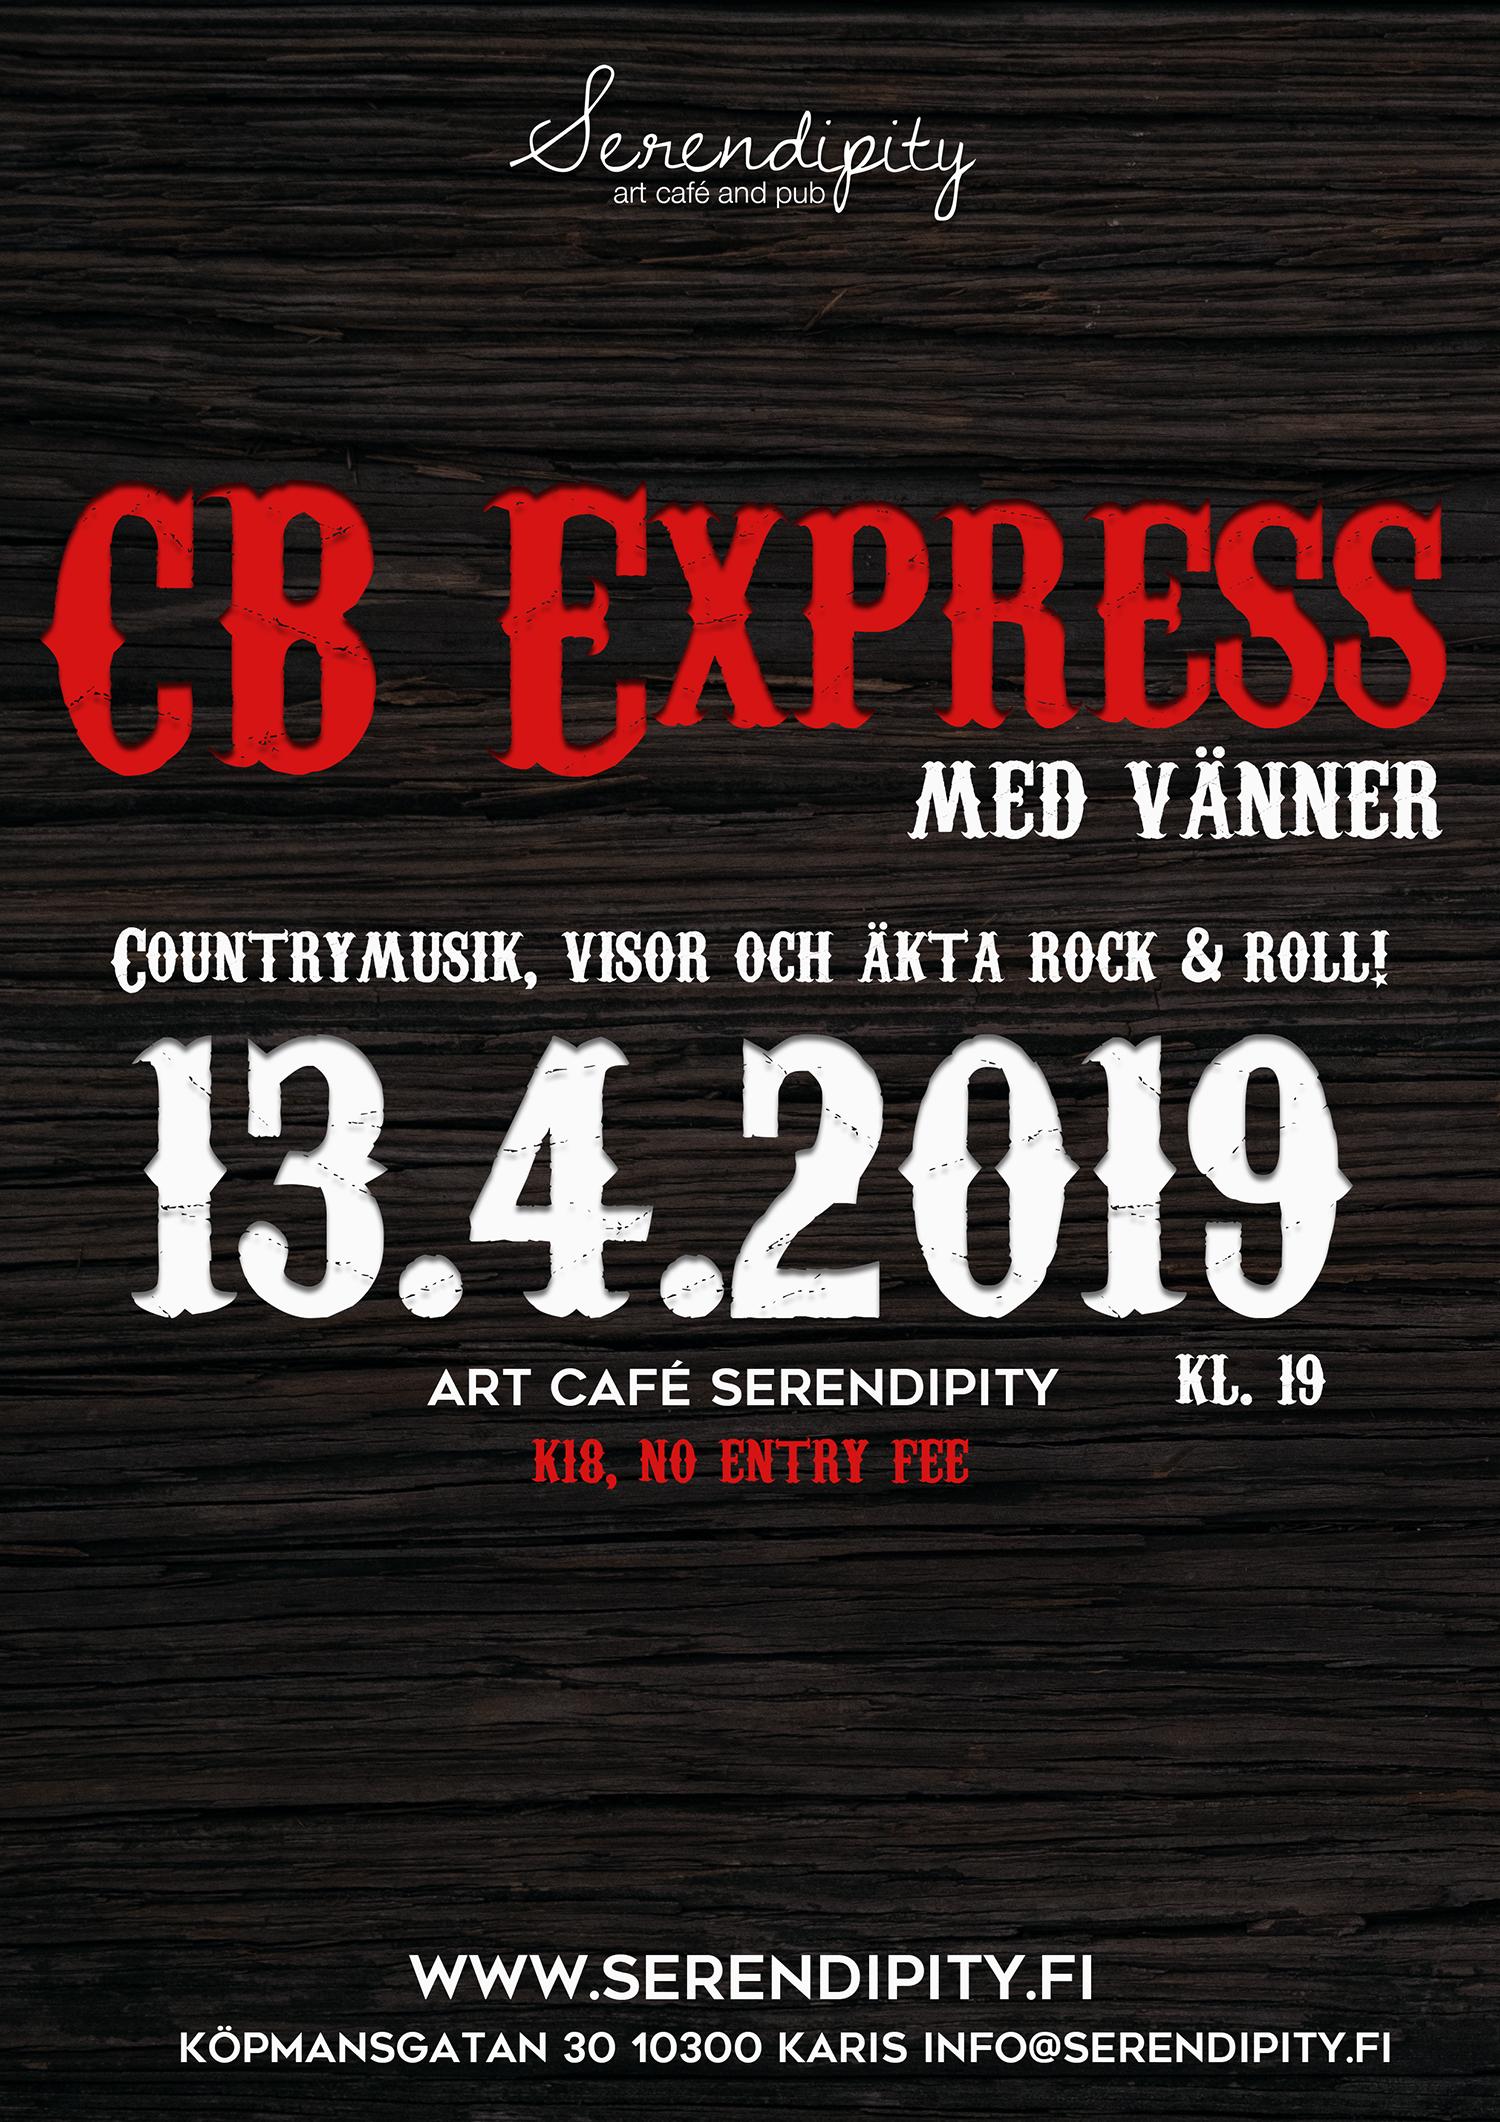 CbExpress kopiera.jpg